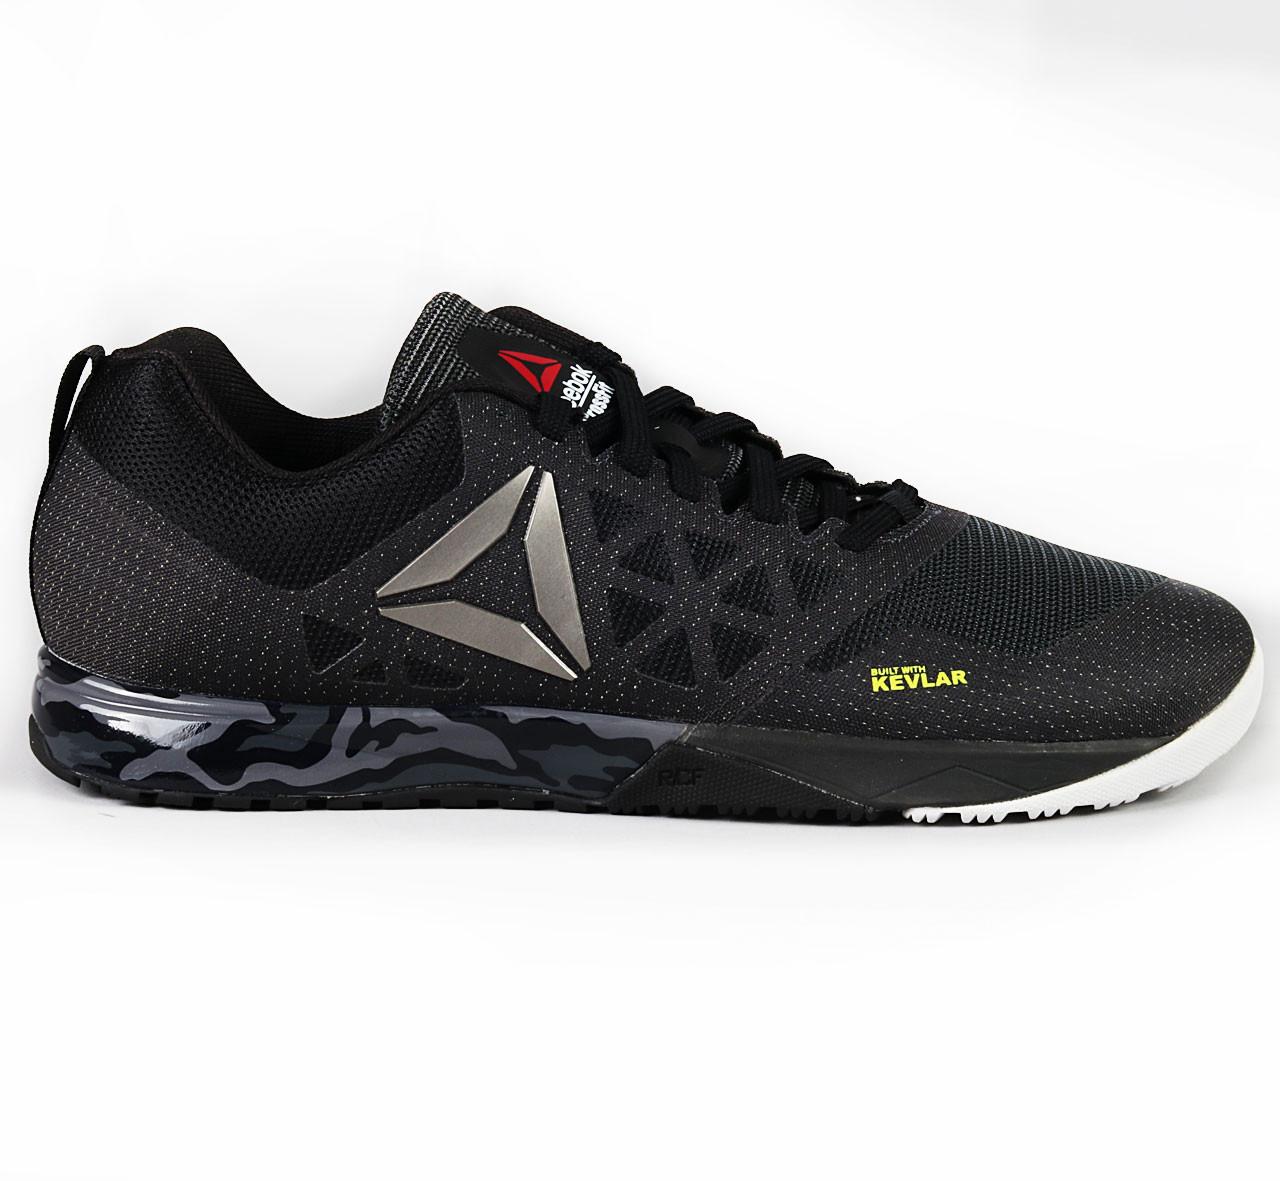 1b526e85fc70 ... Hockey Apparel  Size 11.5 Reebok Crossfit Nano 6.0 Training Shoes.  Image 1